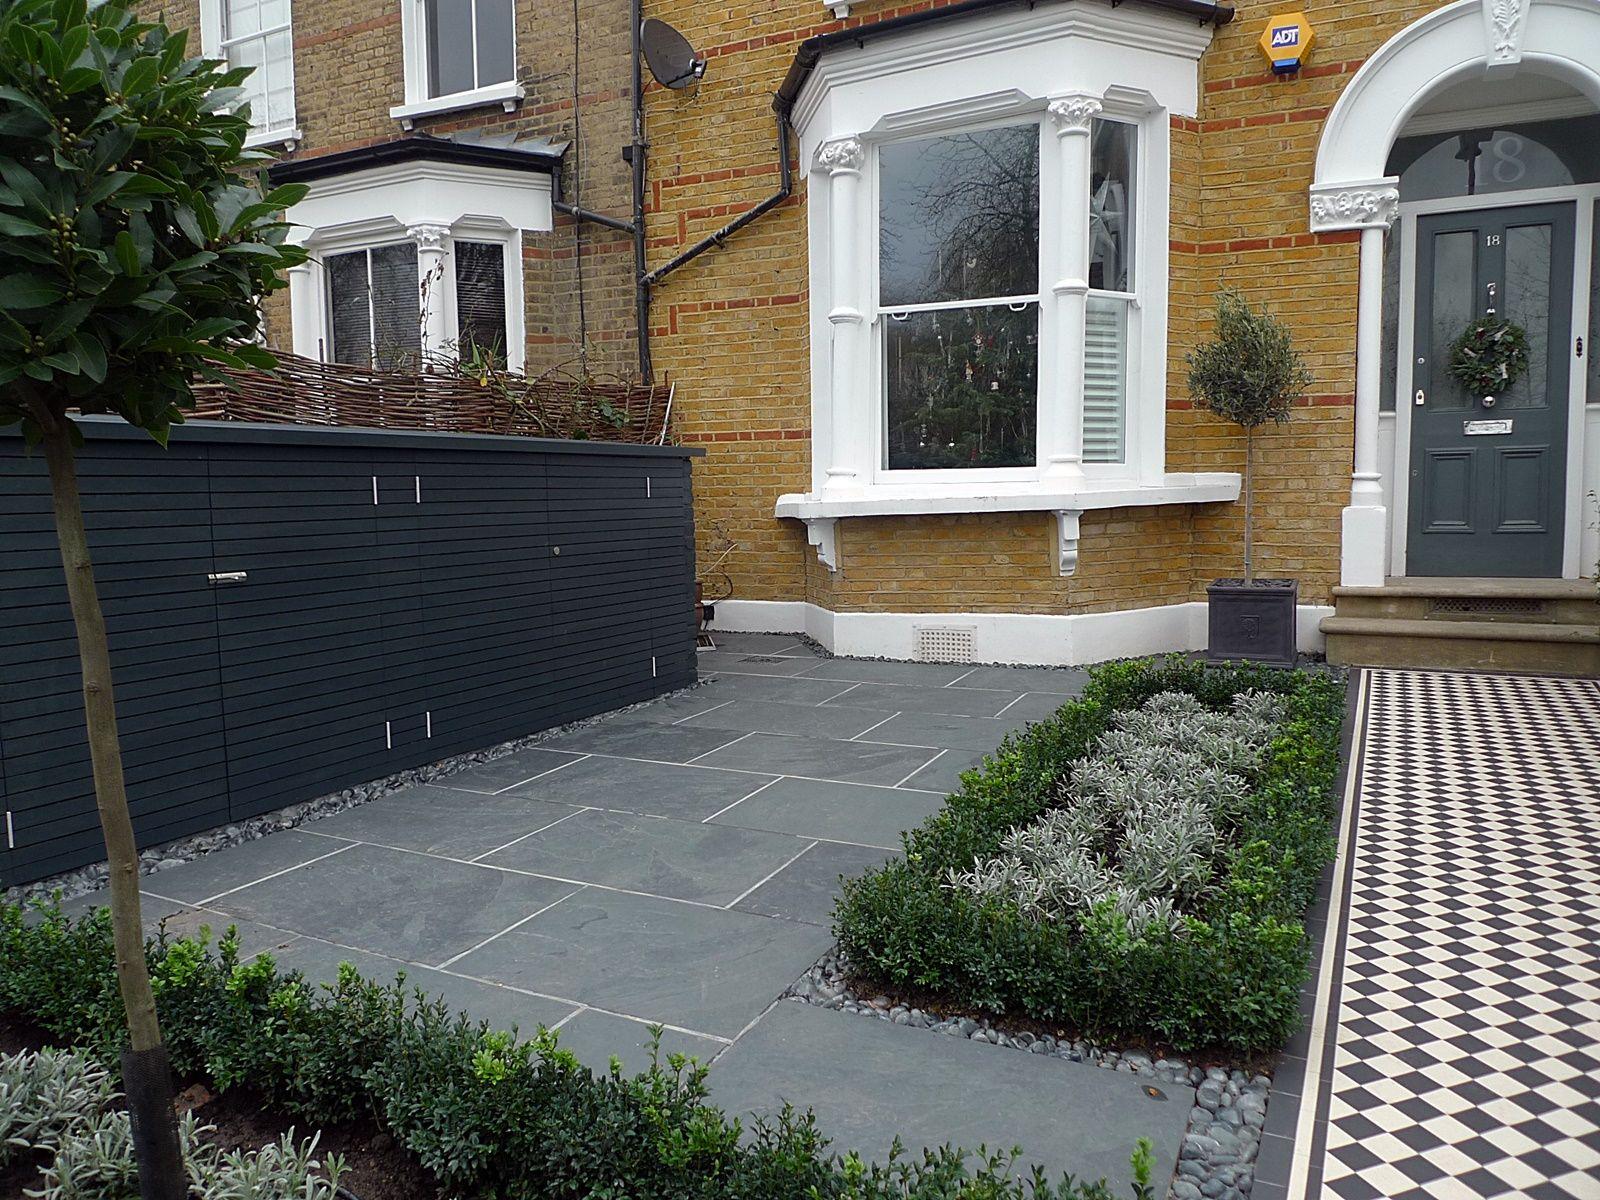 front garden victorian tile topairy bike bin store mosaic black